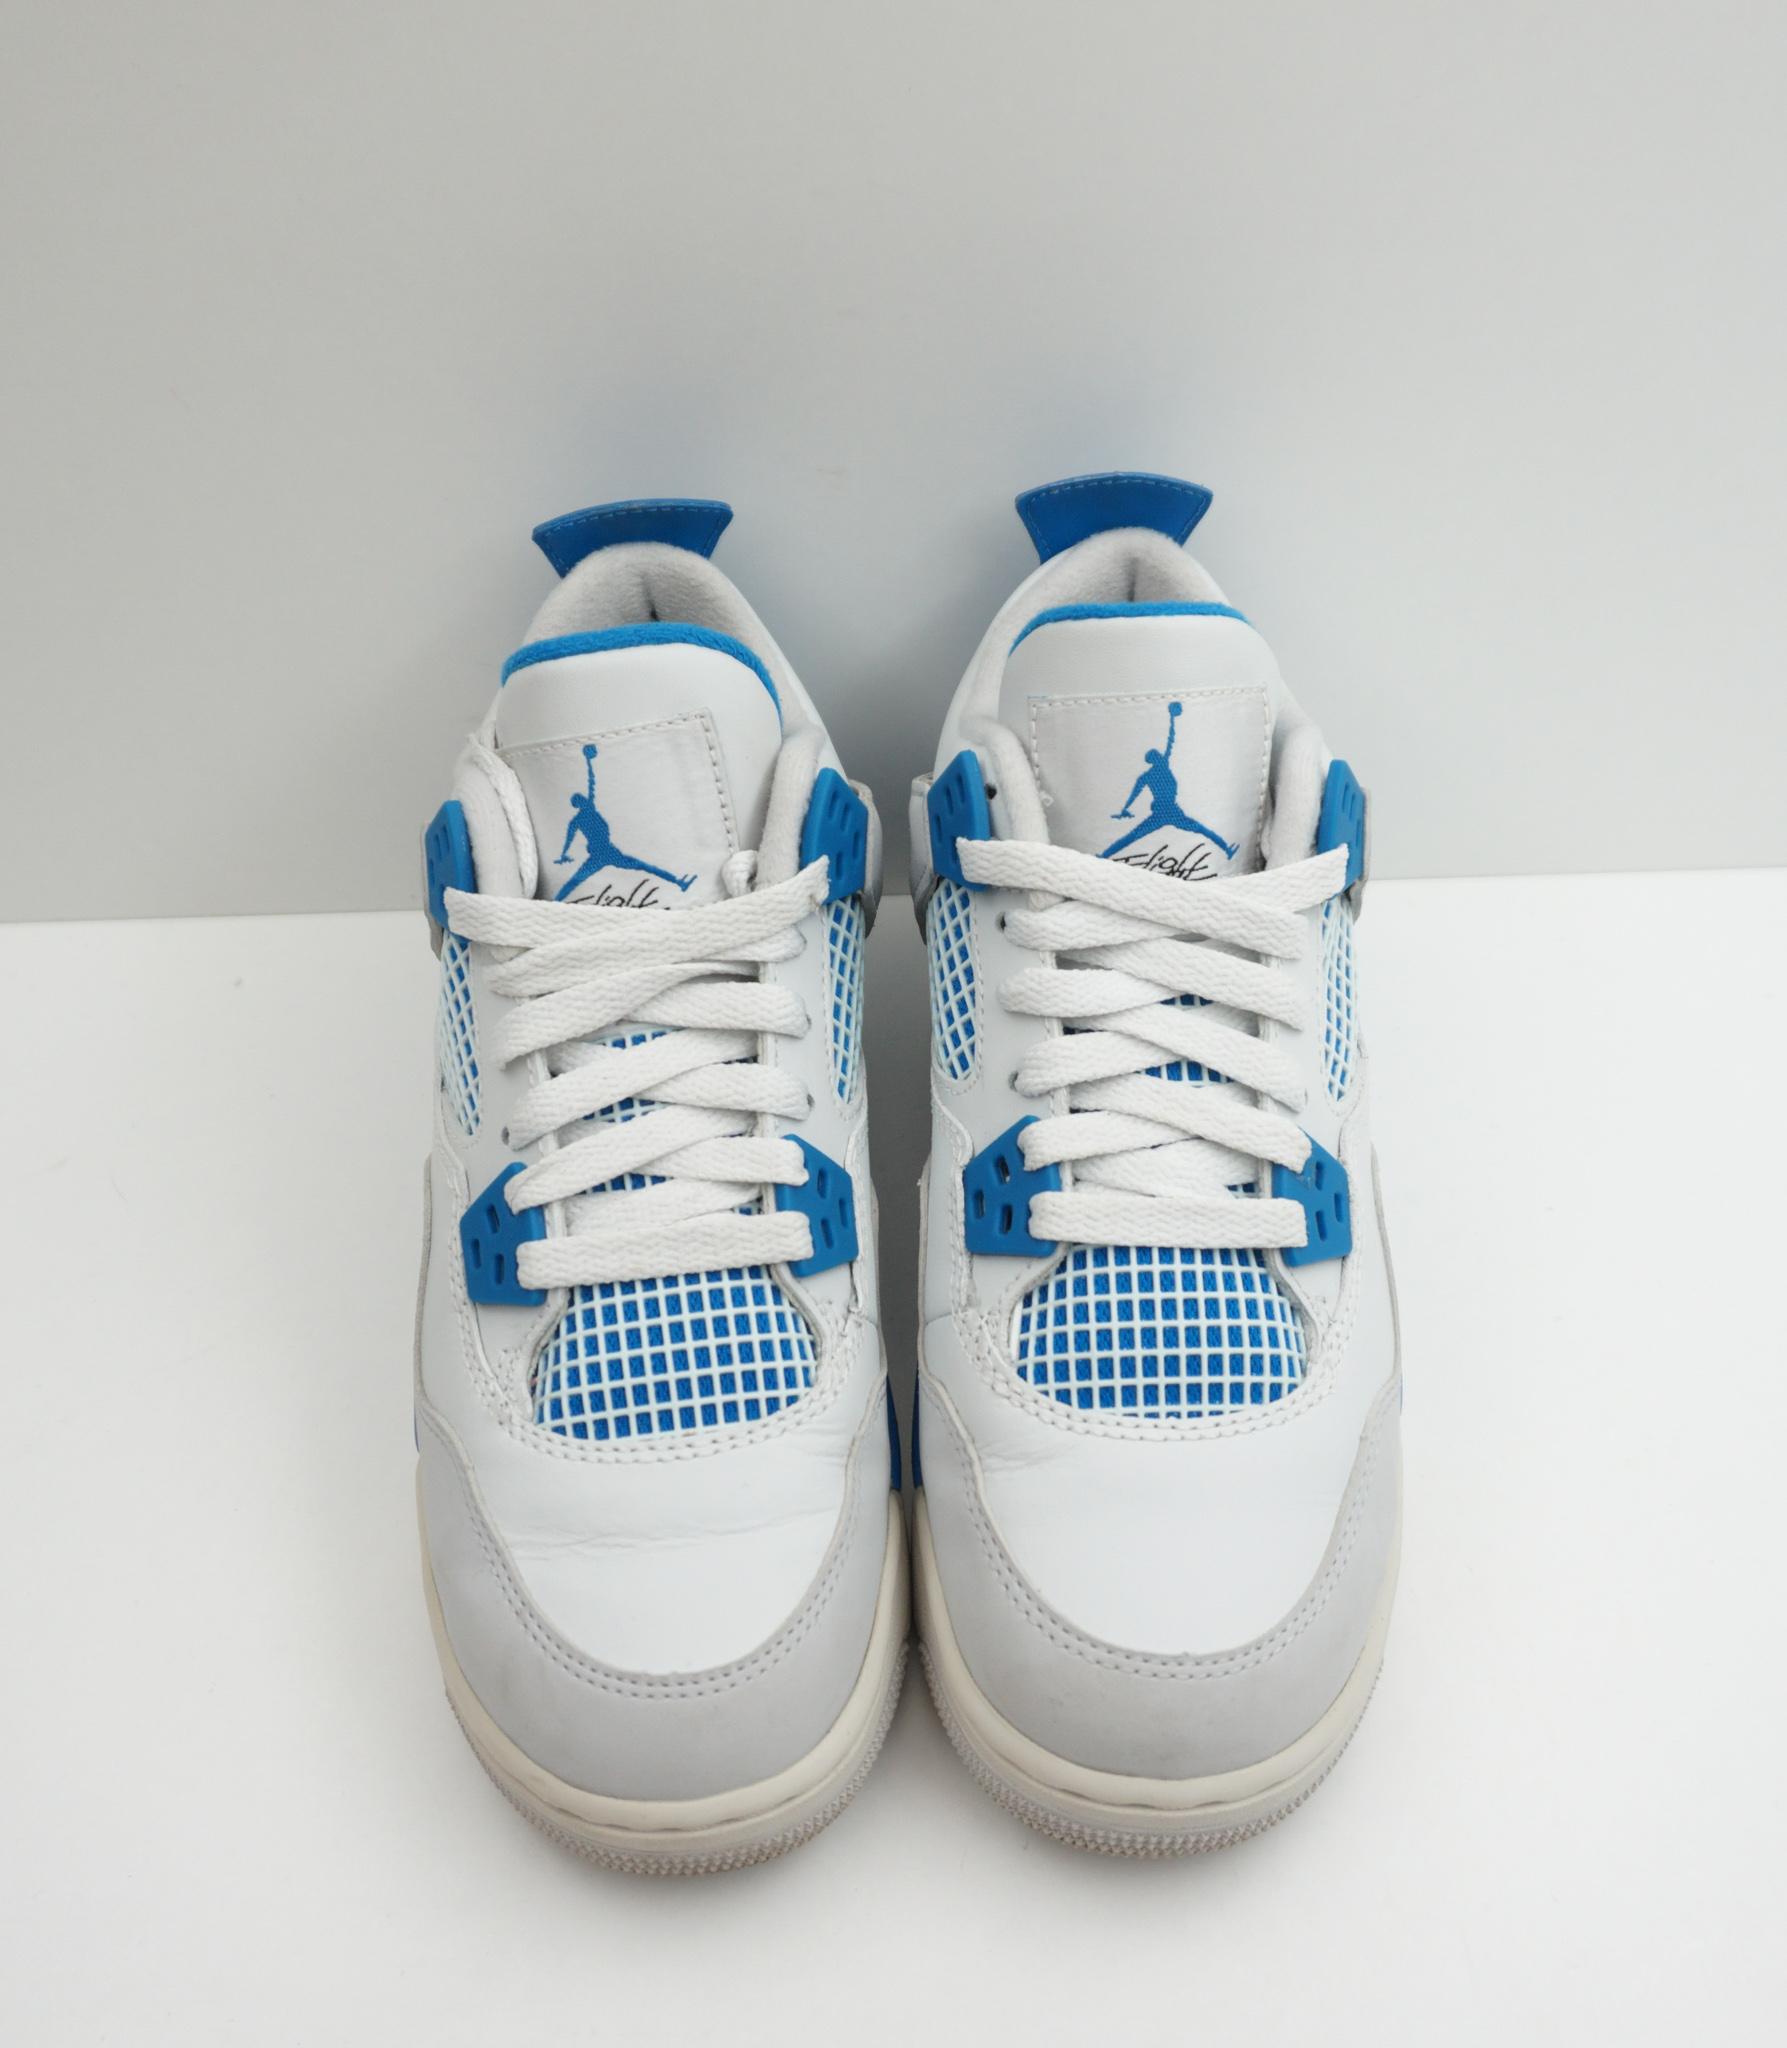 Jordan 4 Retro GS Military Blue (2012)